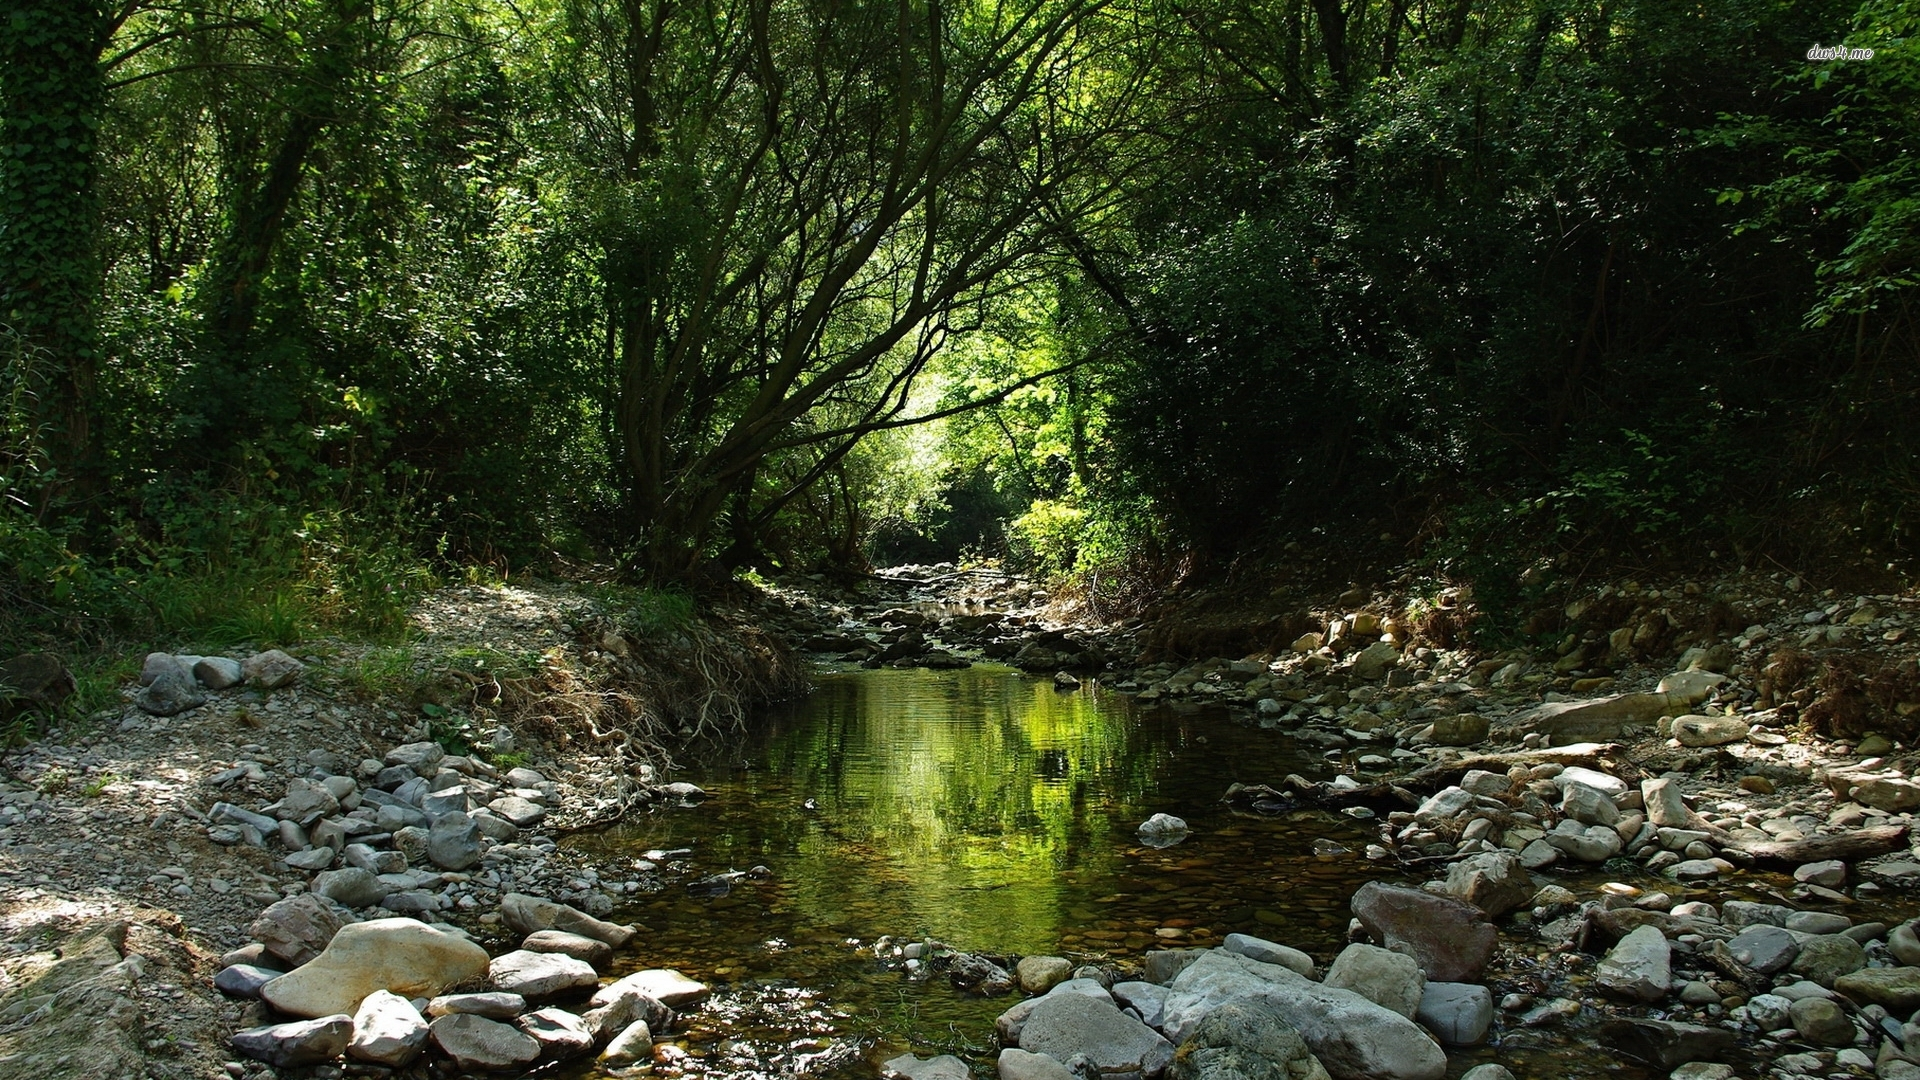 ... Forest stream wallpaper 1920x1080 ...